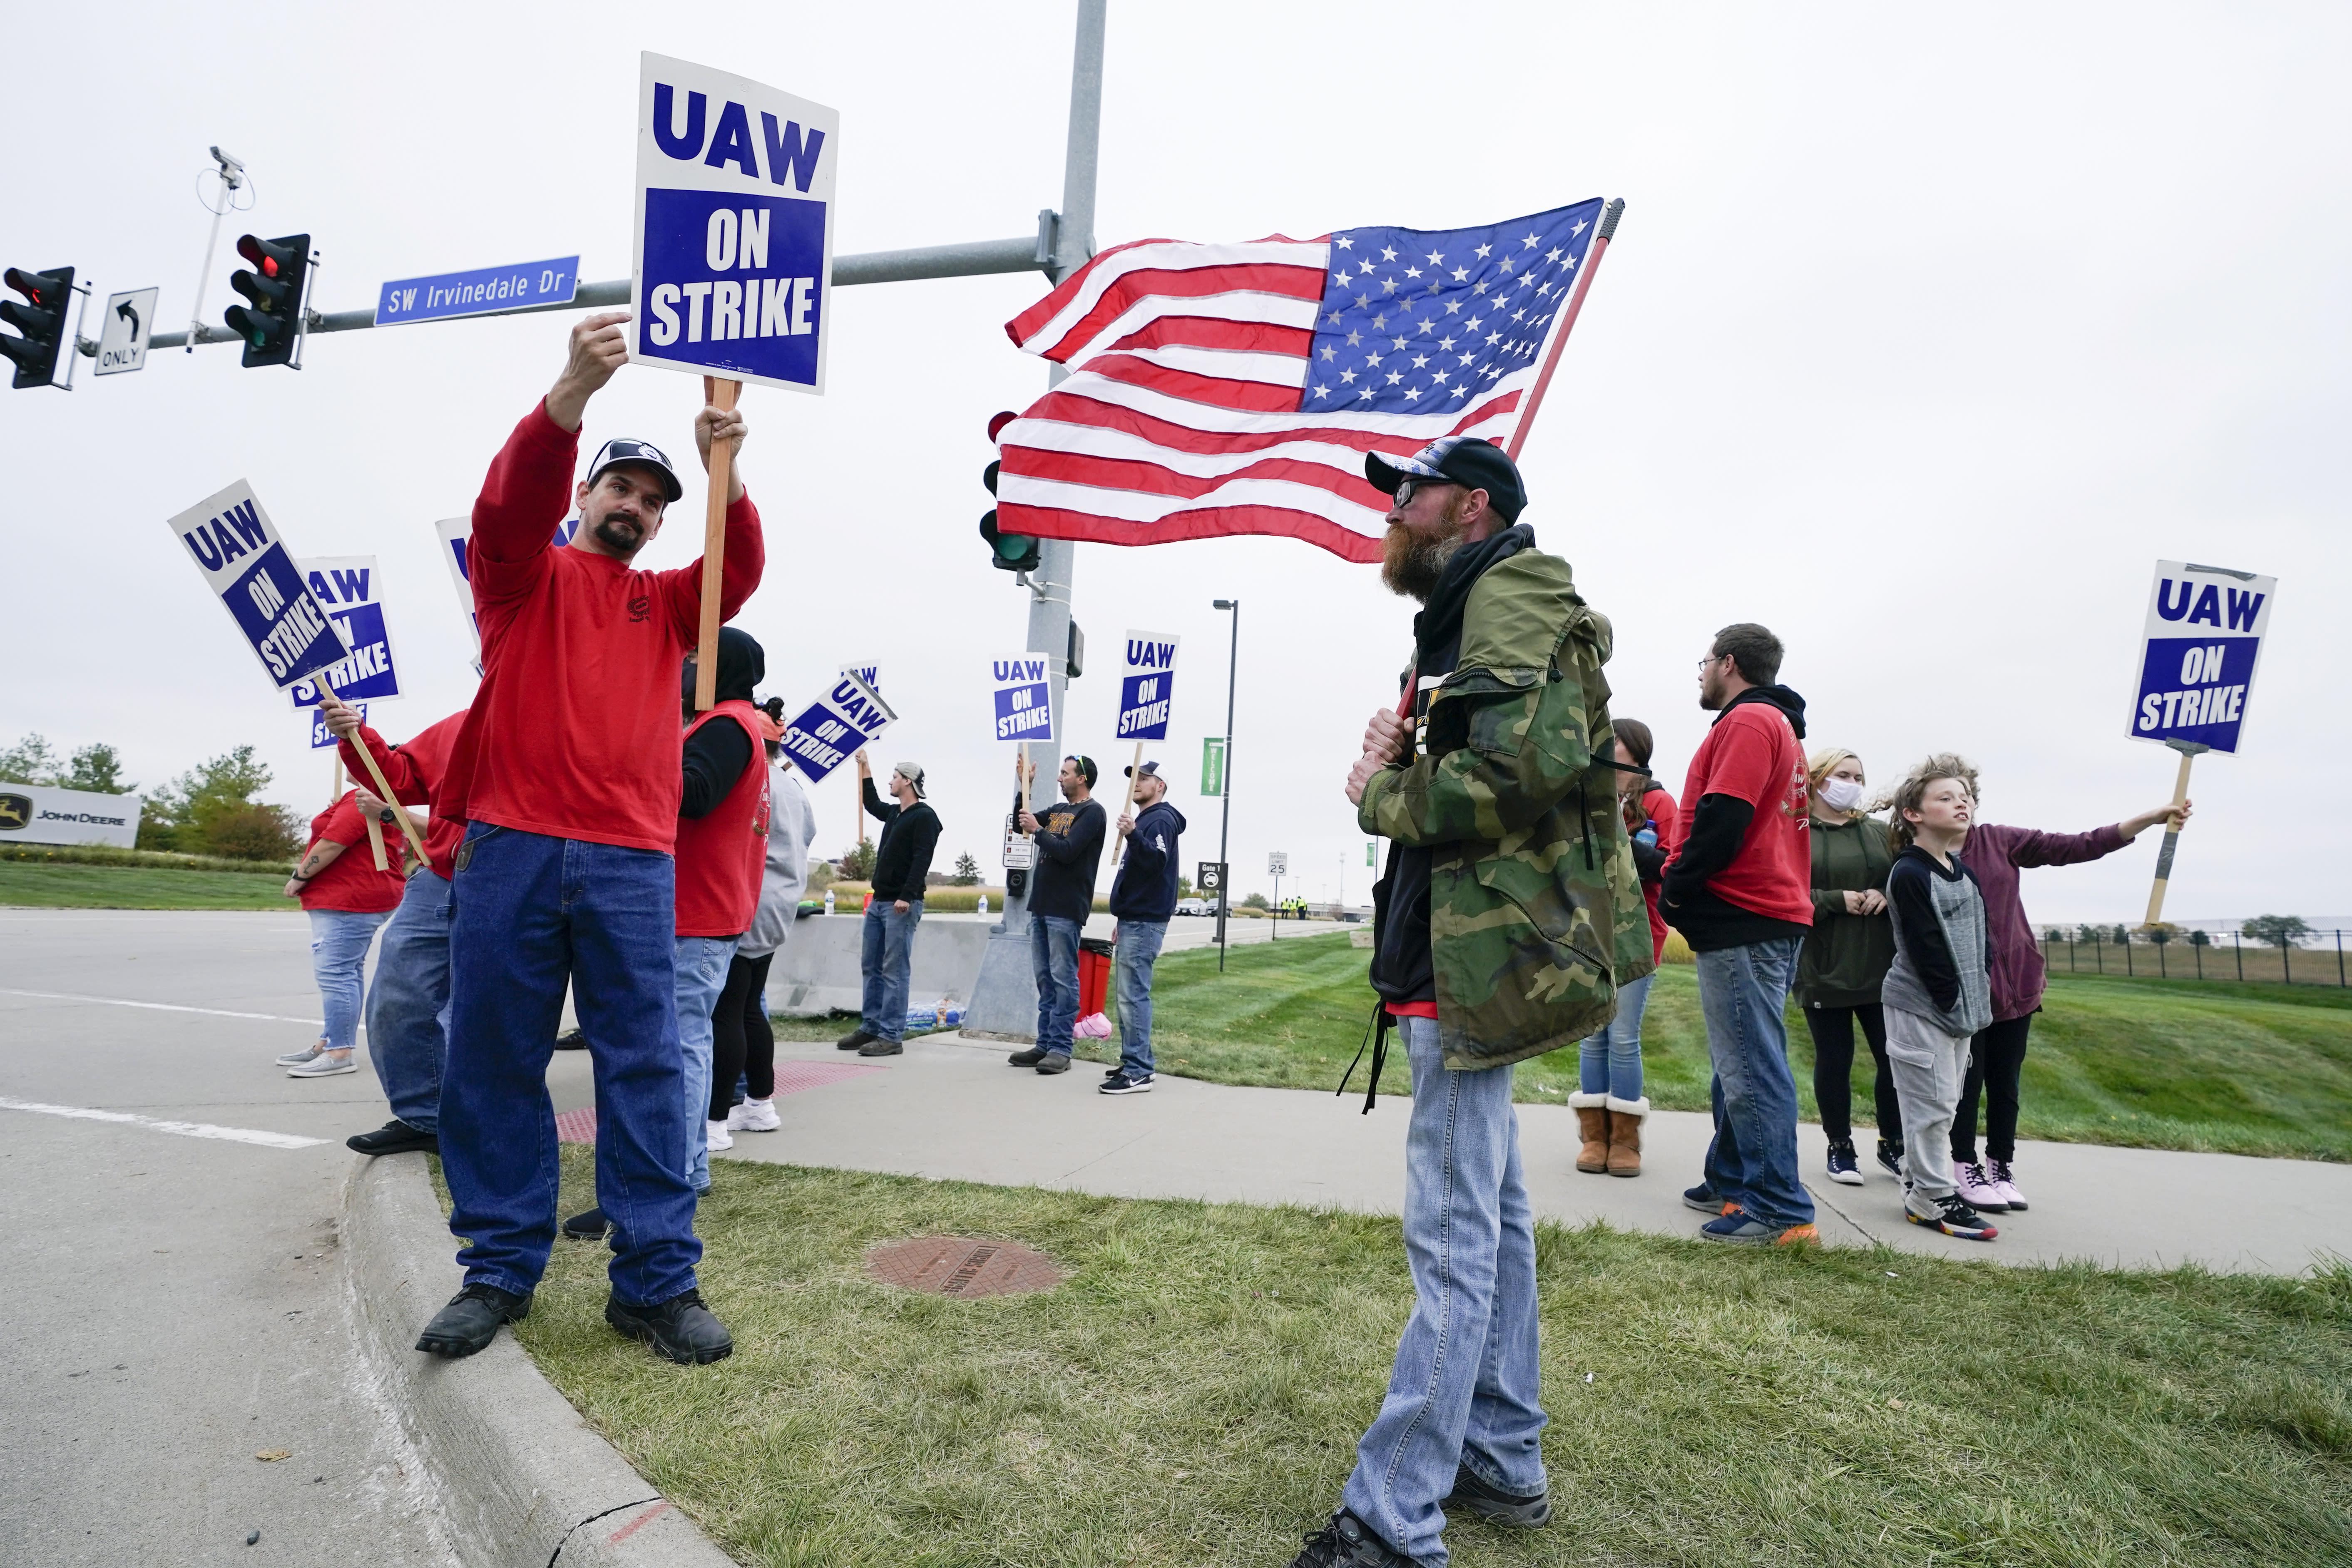 Judge limits strikers' conduct at Deere plant in Iowa